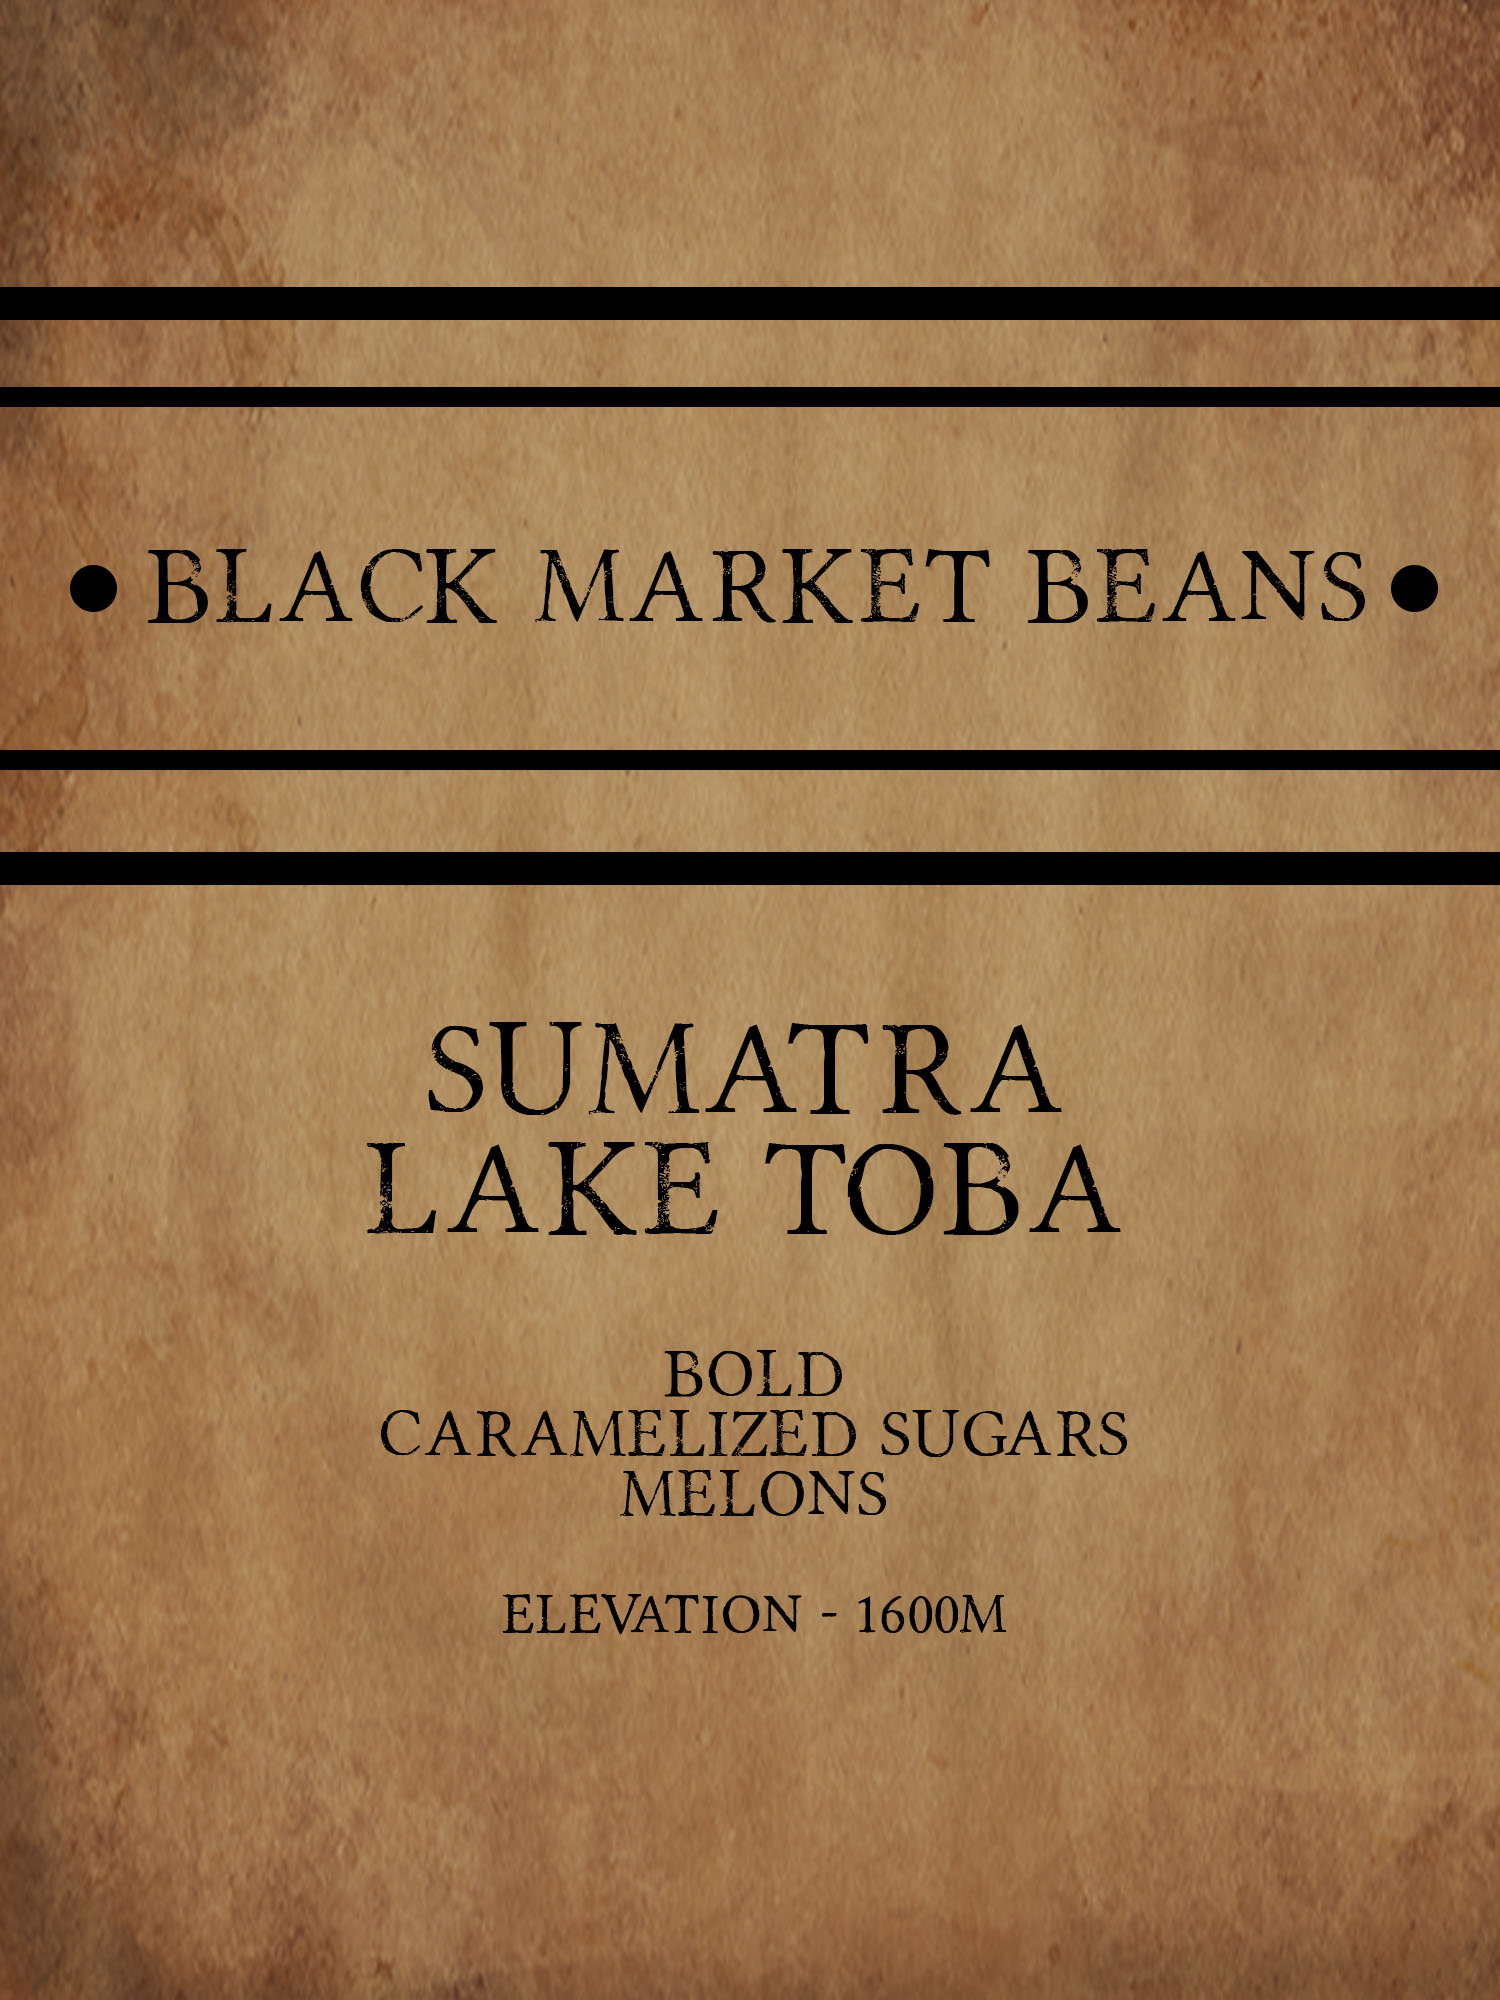 coffee_Sumatra_LakeToba.jpg